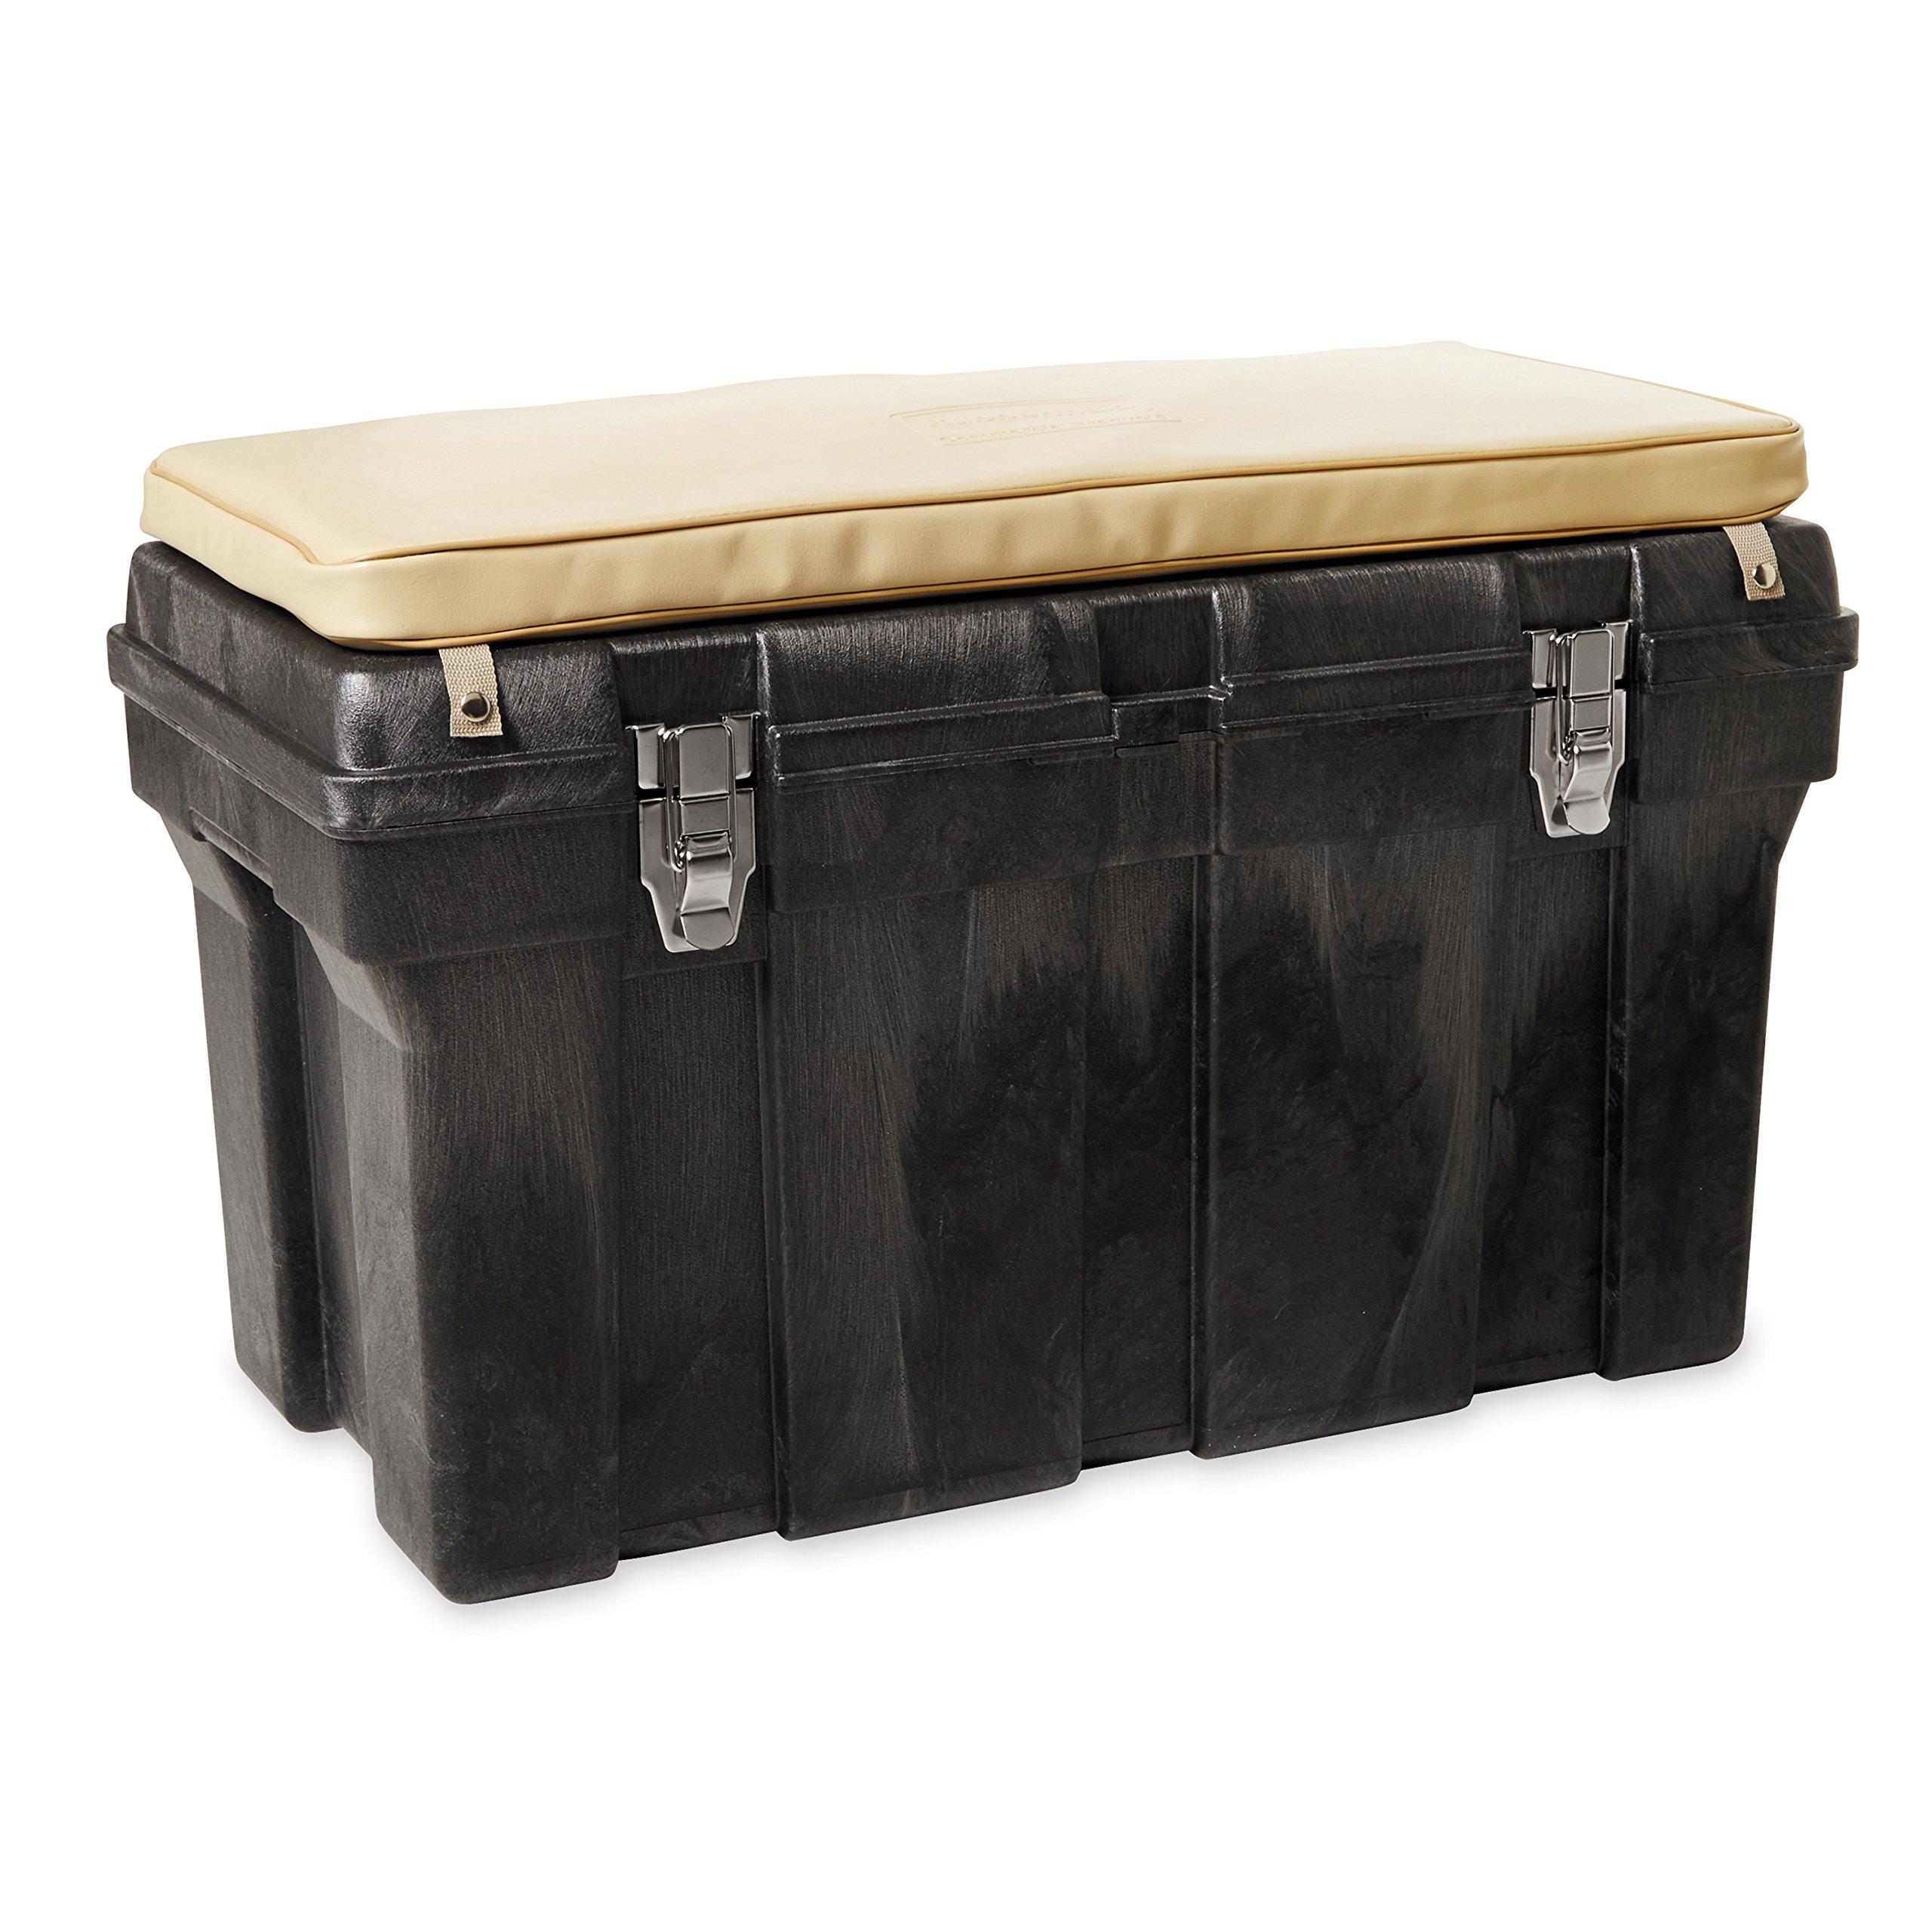 Rubbermaid Commercial Tack Box, 36'', Black, FG772000BLA